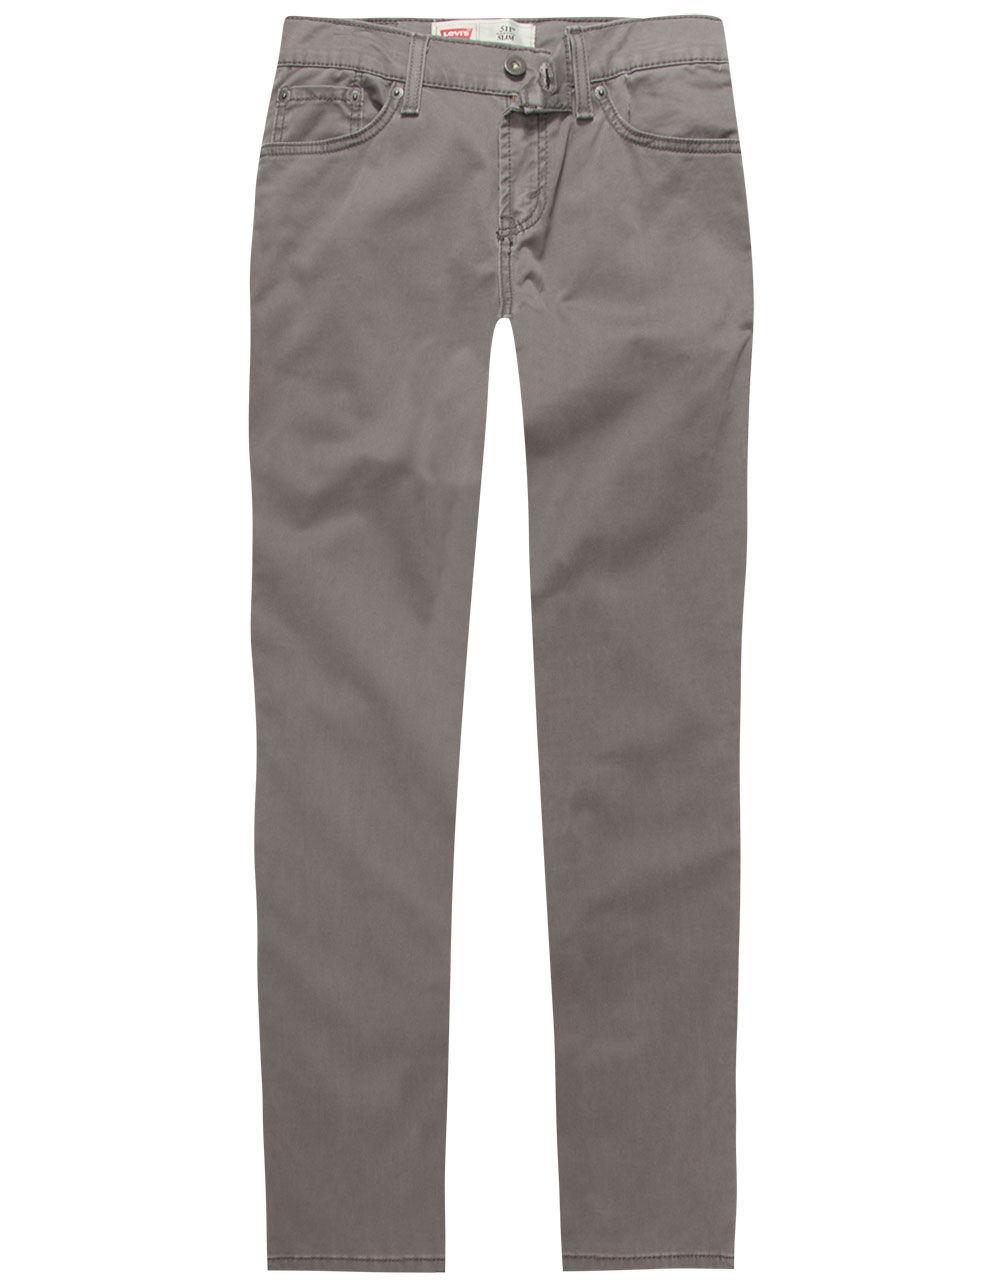 LEVI'S 511 Boys Slim Pants